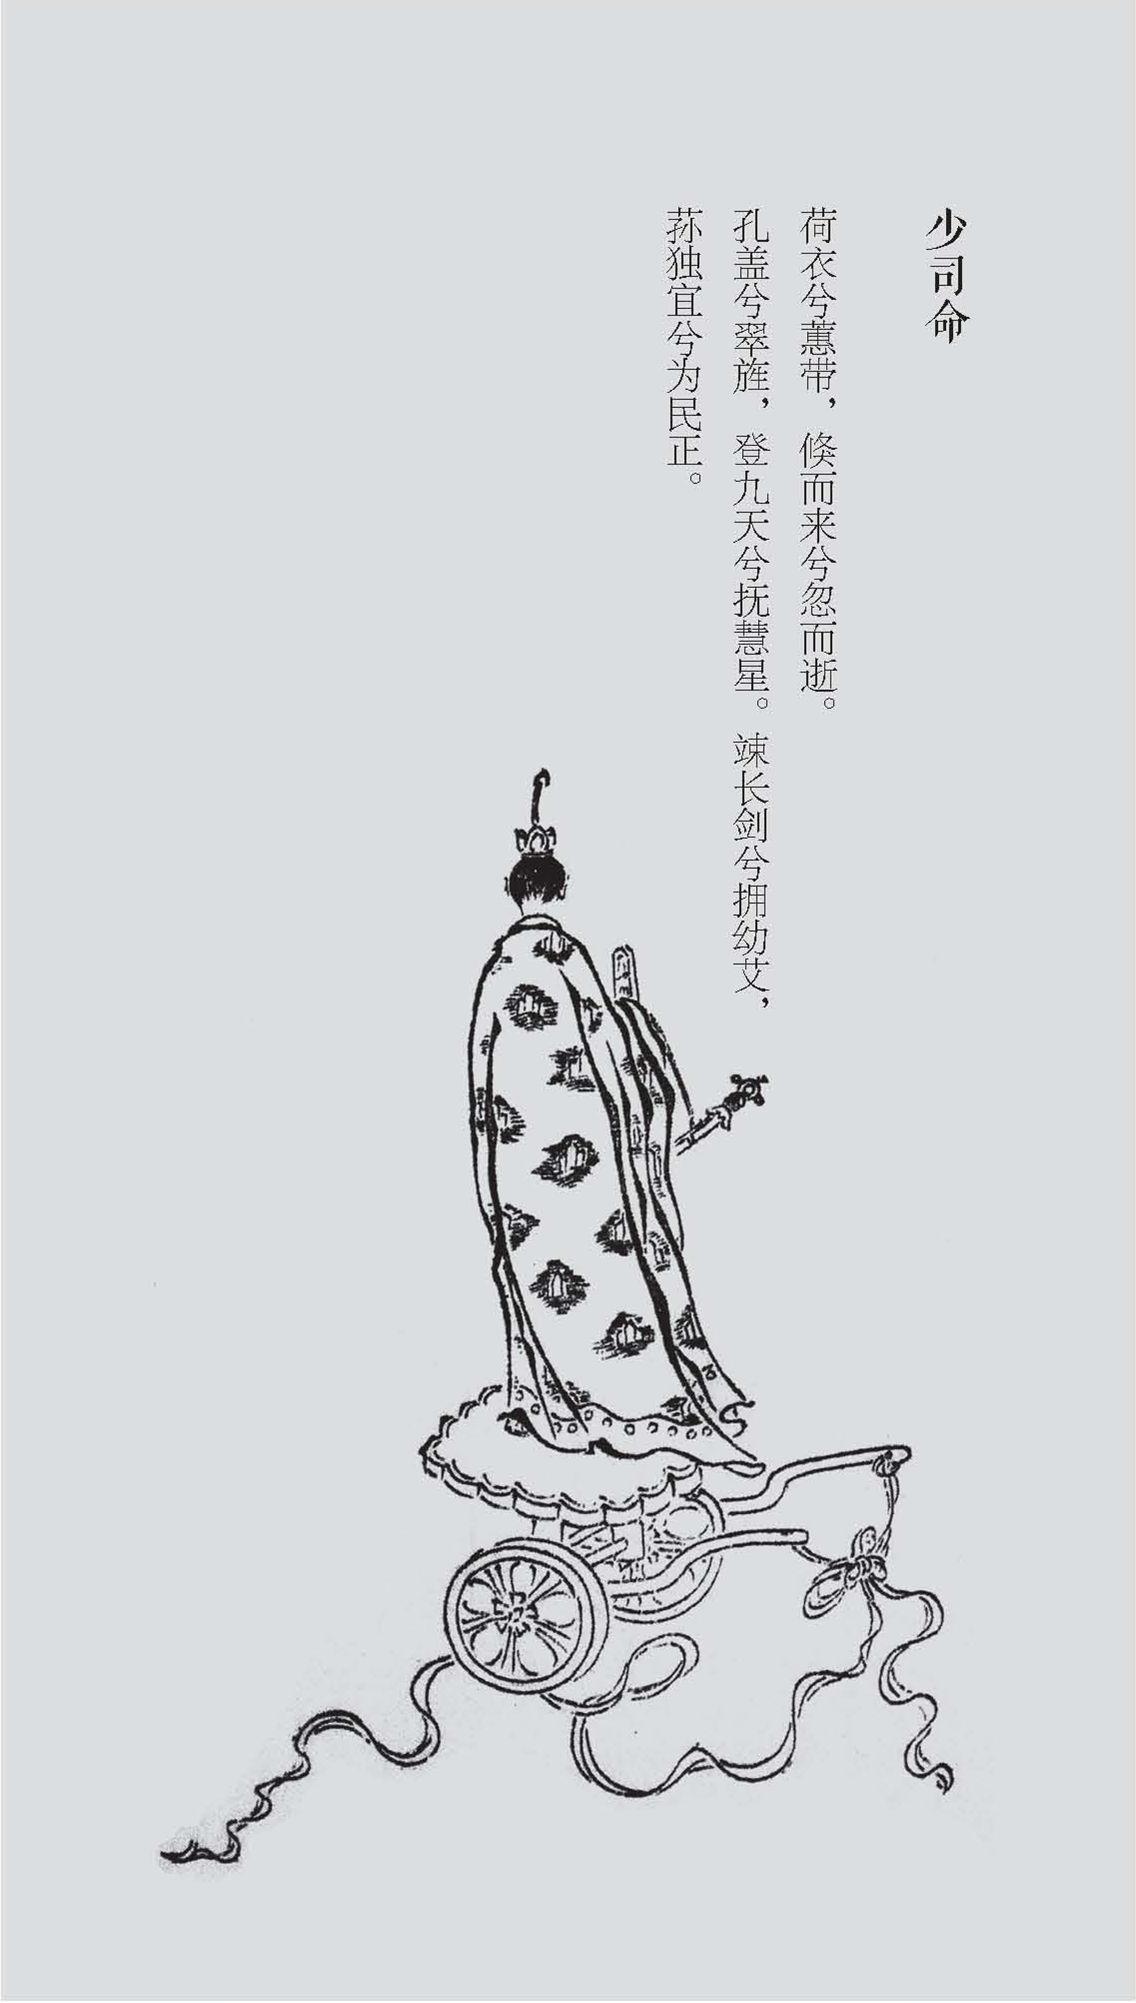 admin的相册 - 楚辞笔记-插图